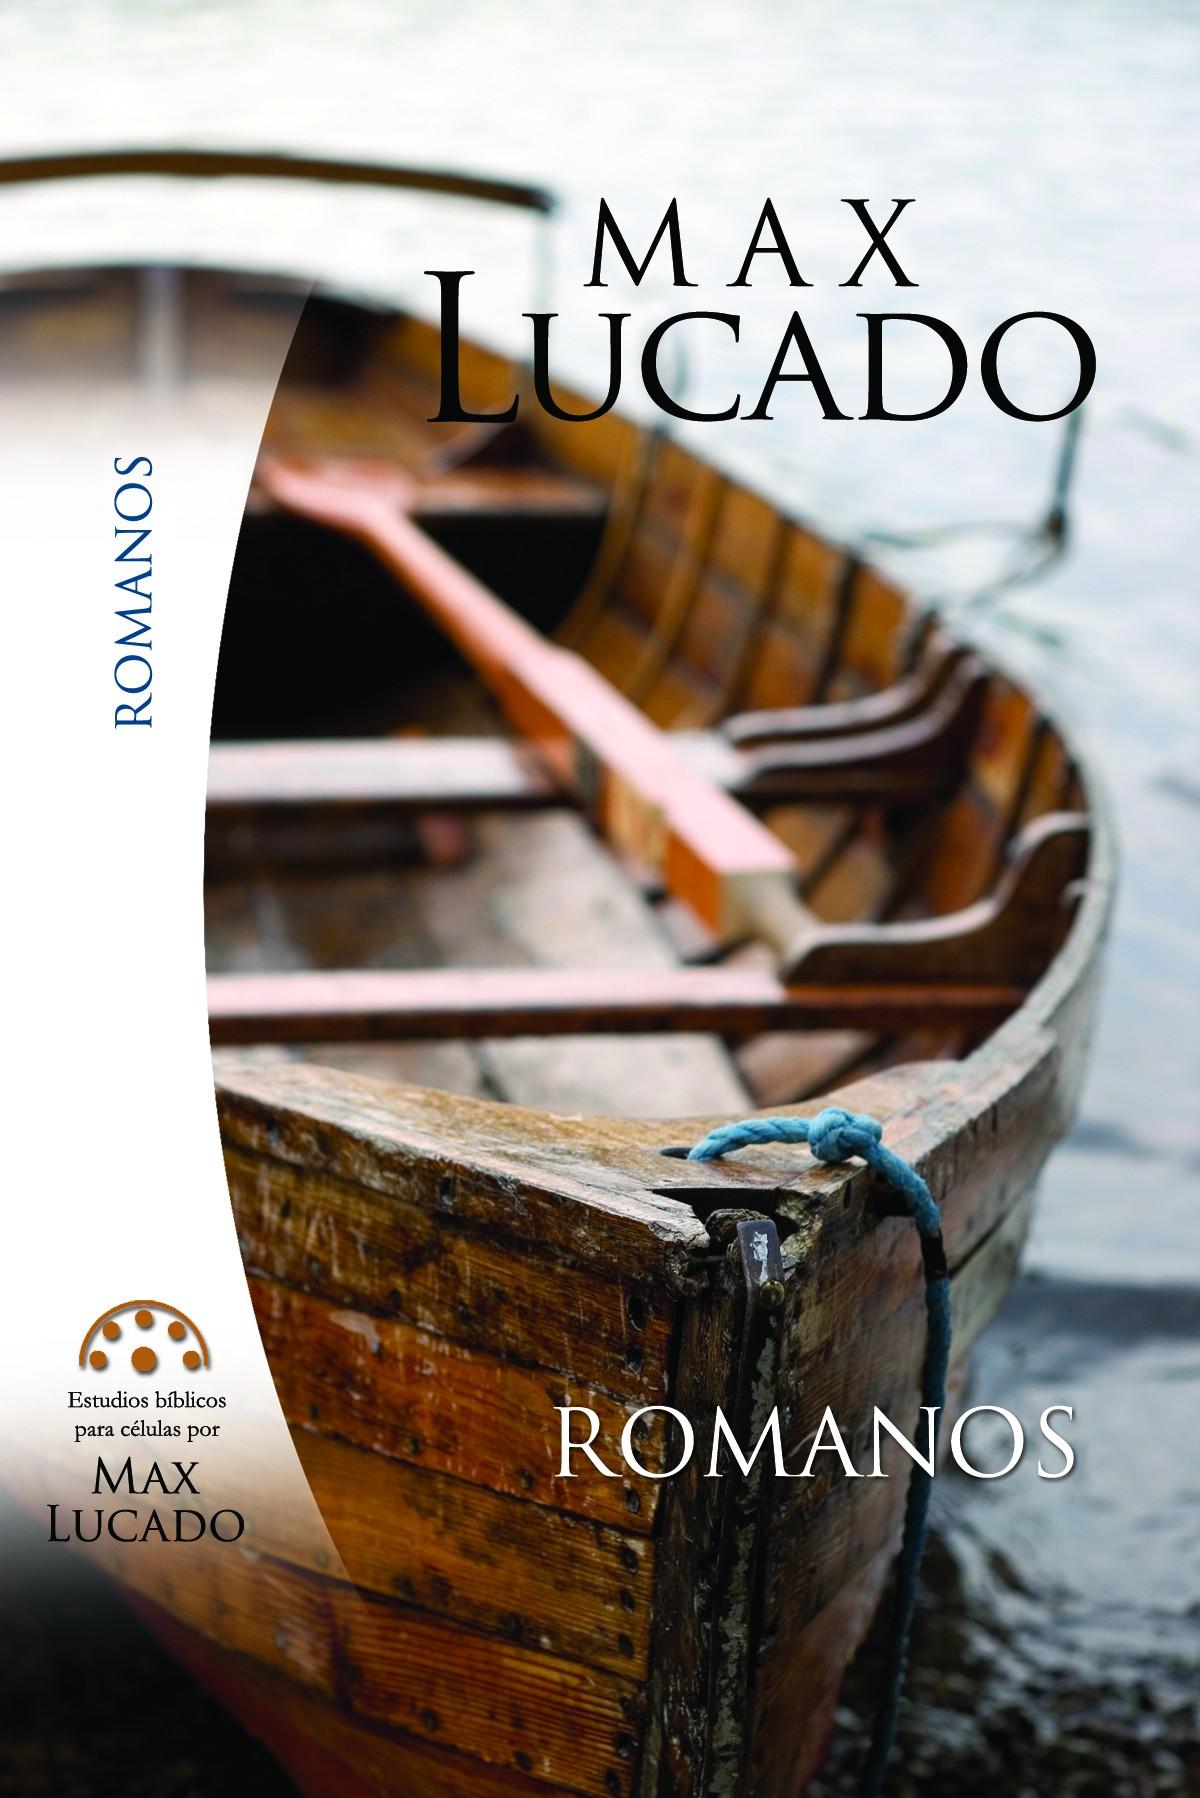 Romanos. Estudios bíblicos para celulas de Max Lucado.